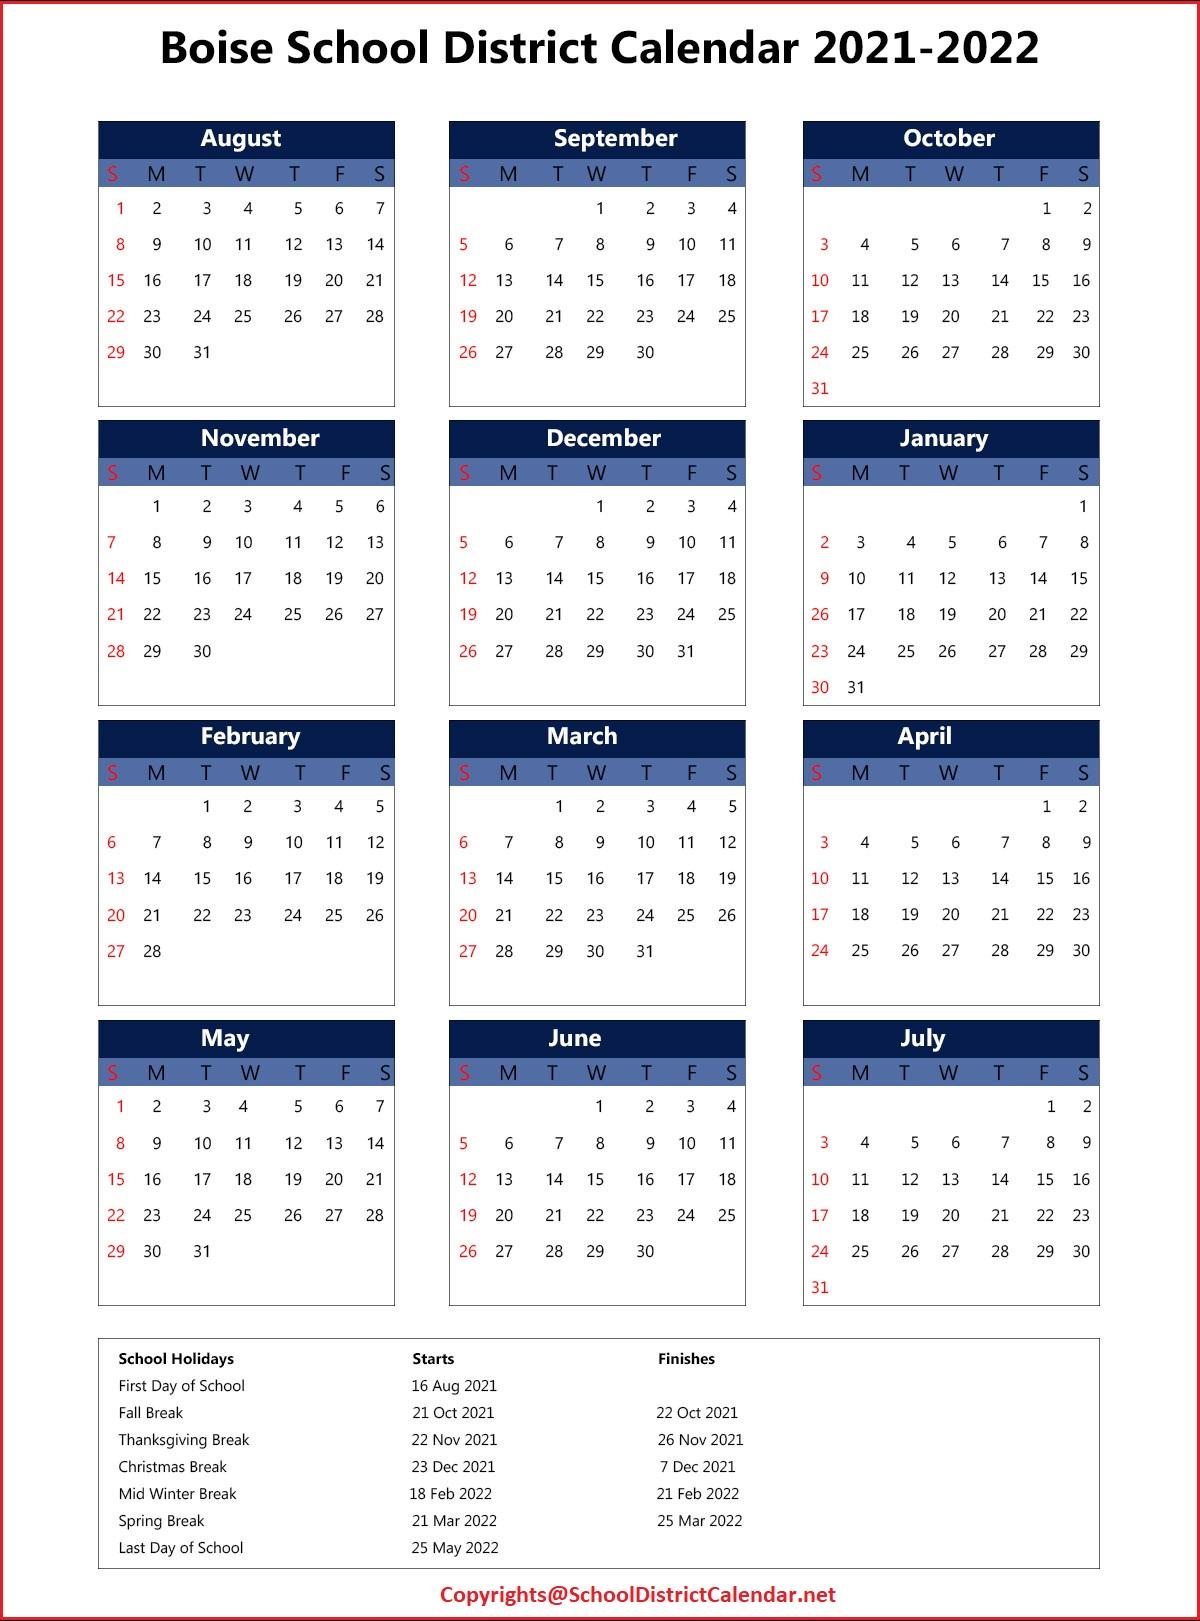 Boise School District Calendar 2021